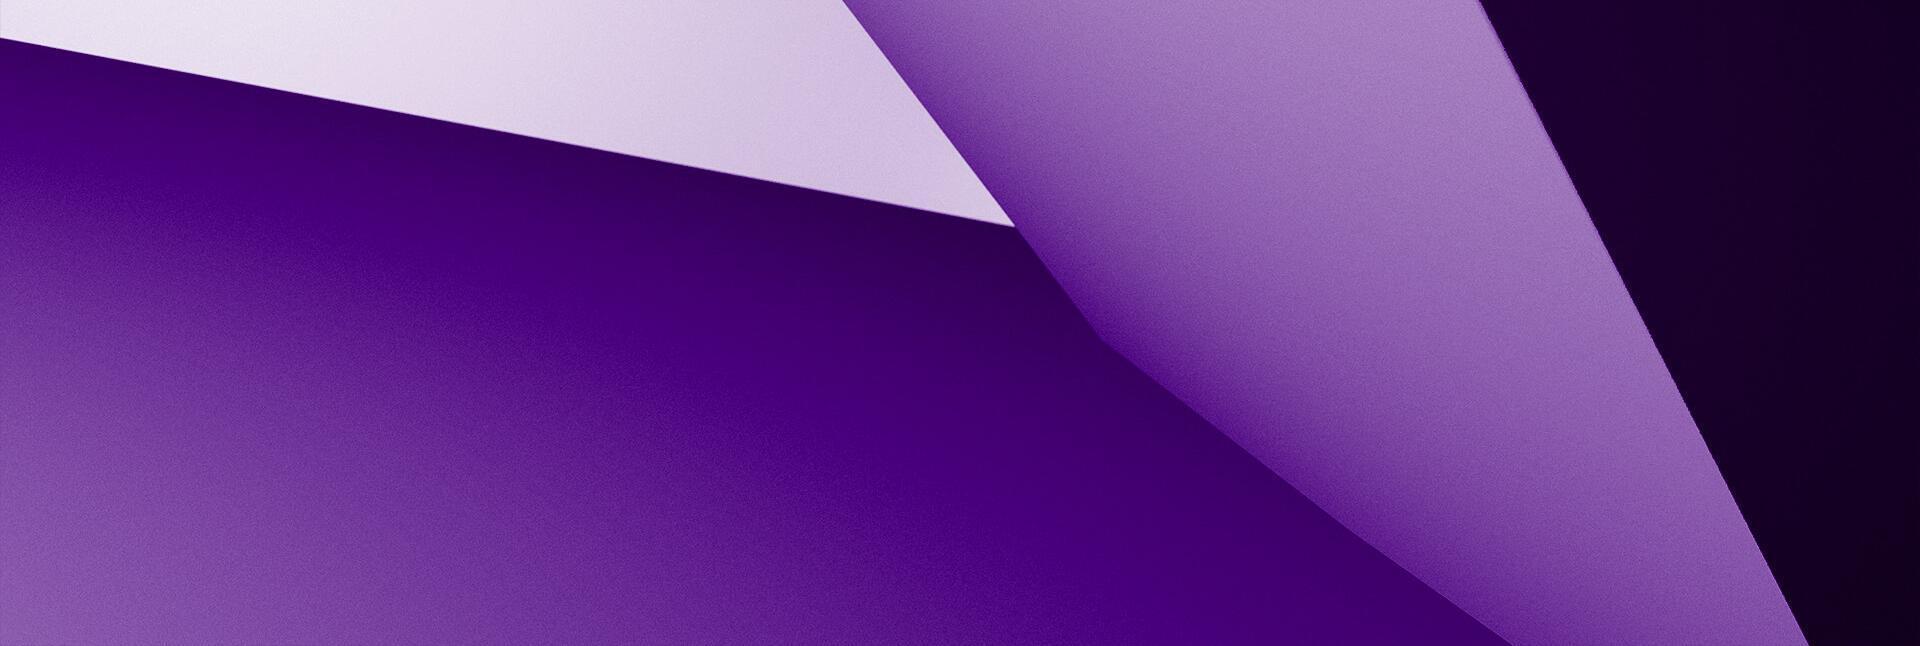 rra-background-purple-2-2018.jpg